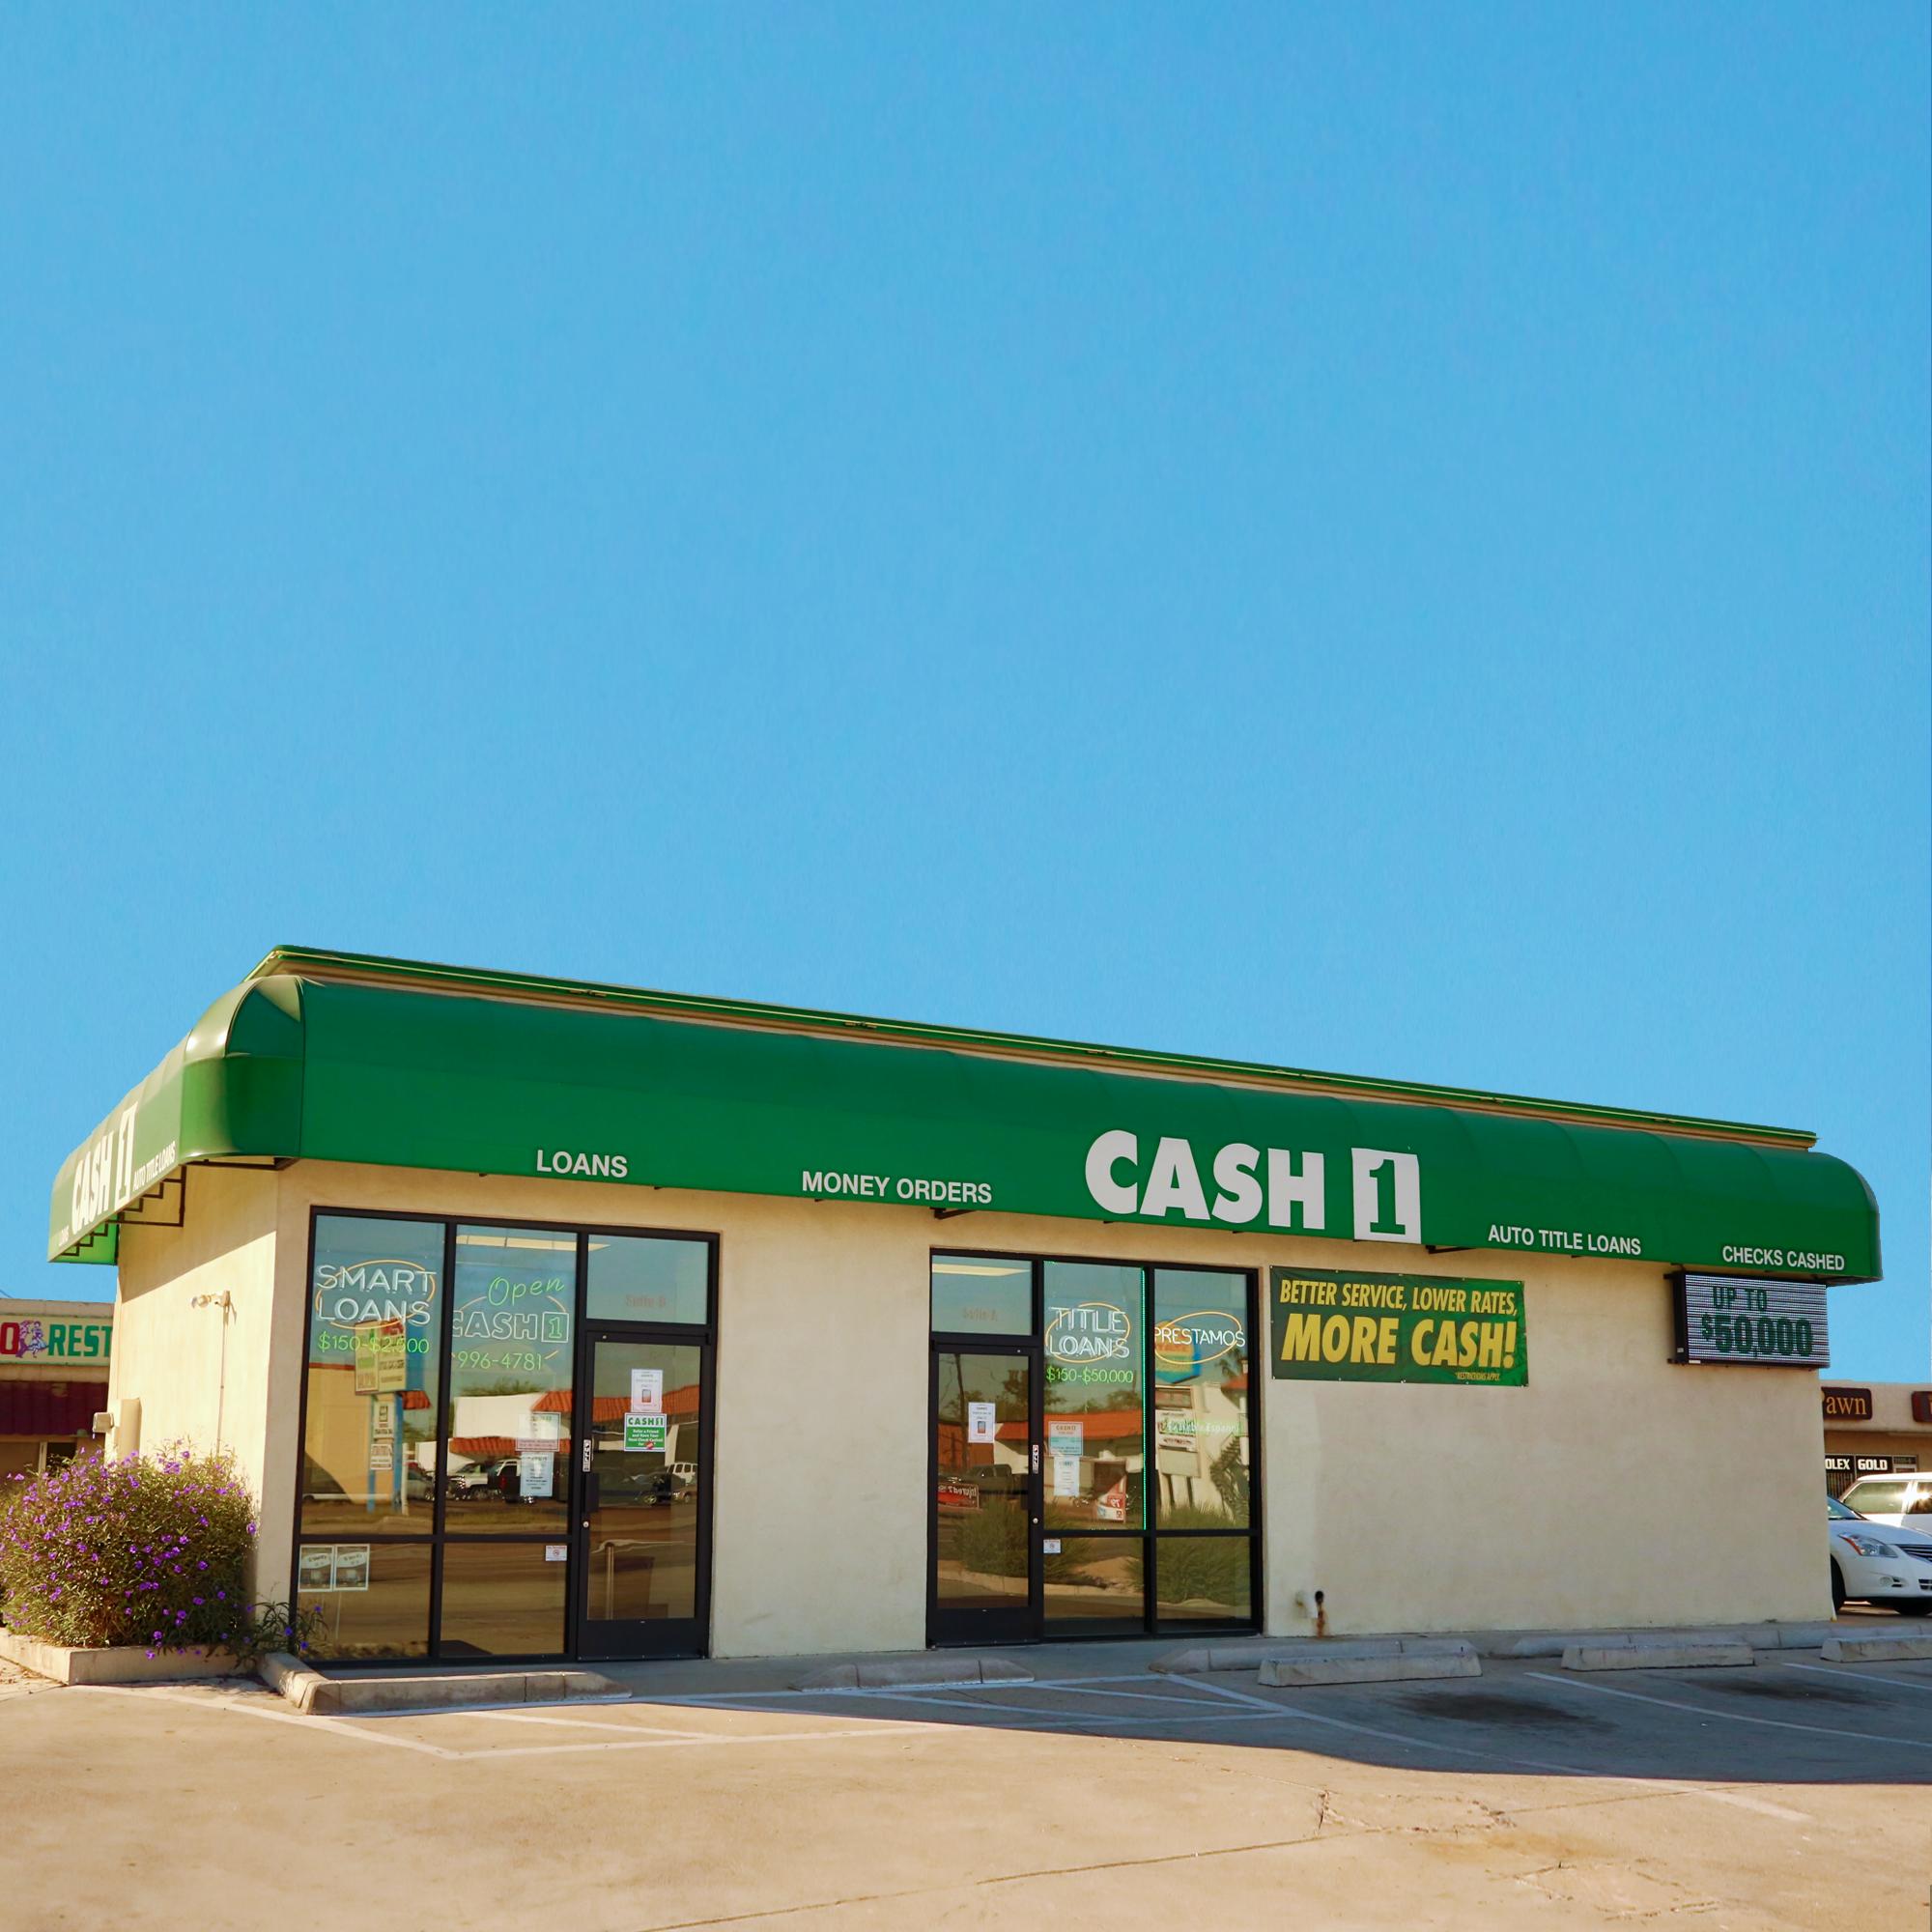 Get cash advance at bank image 10